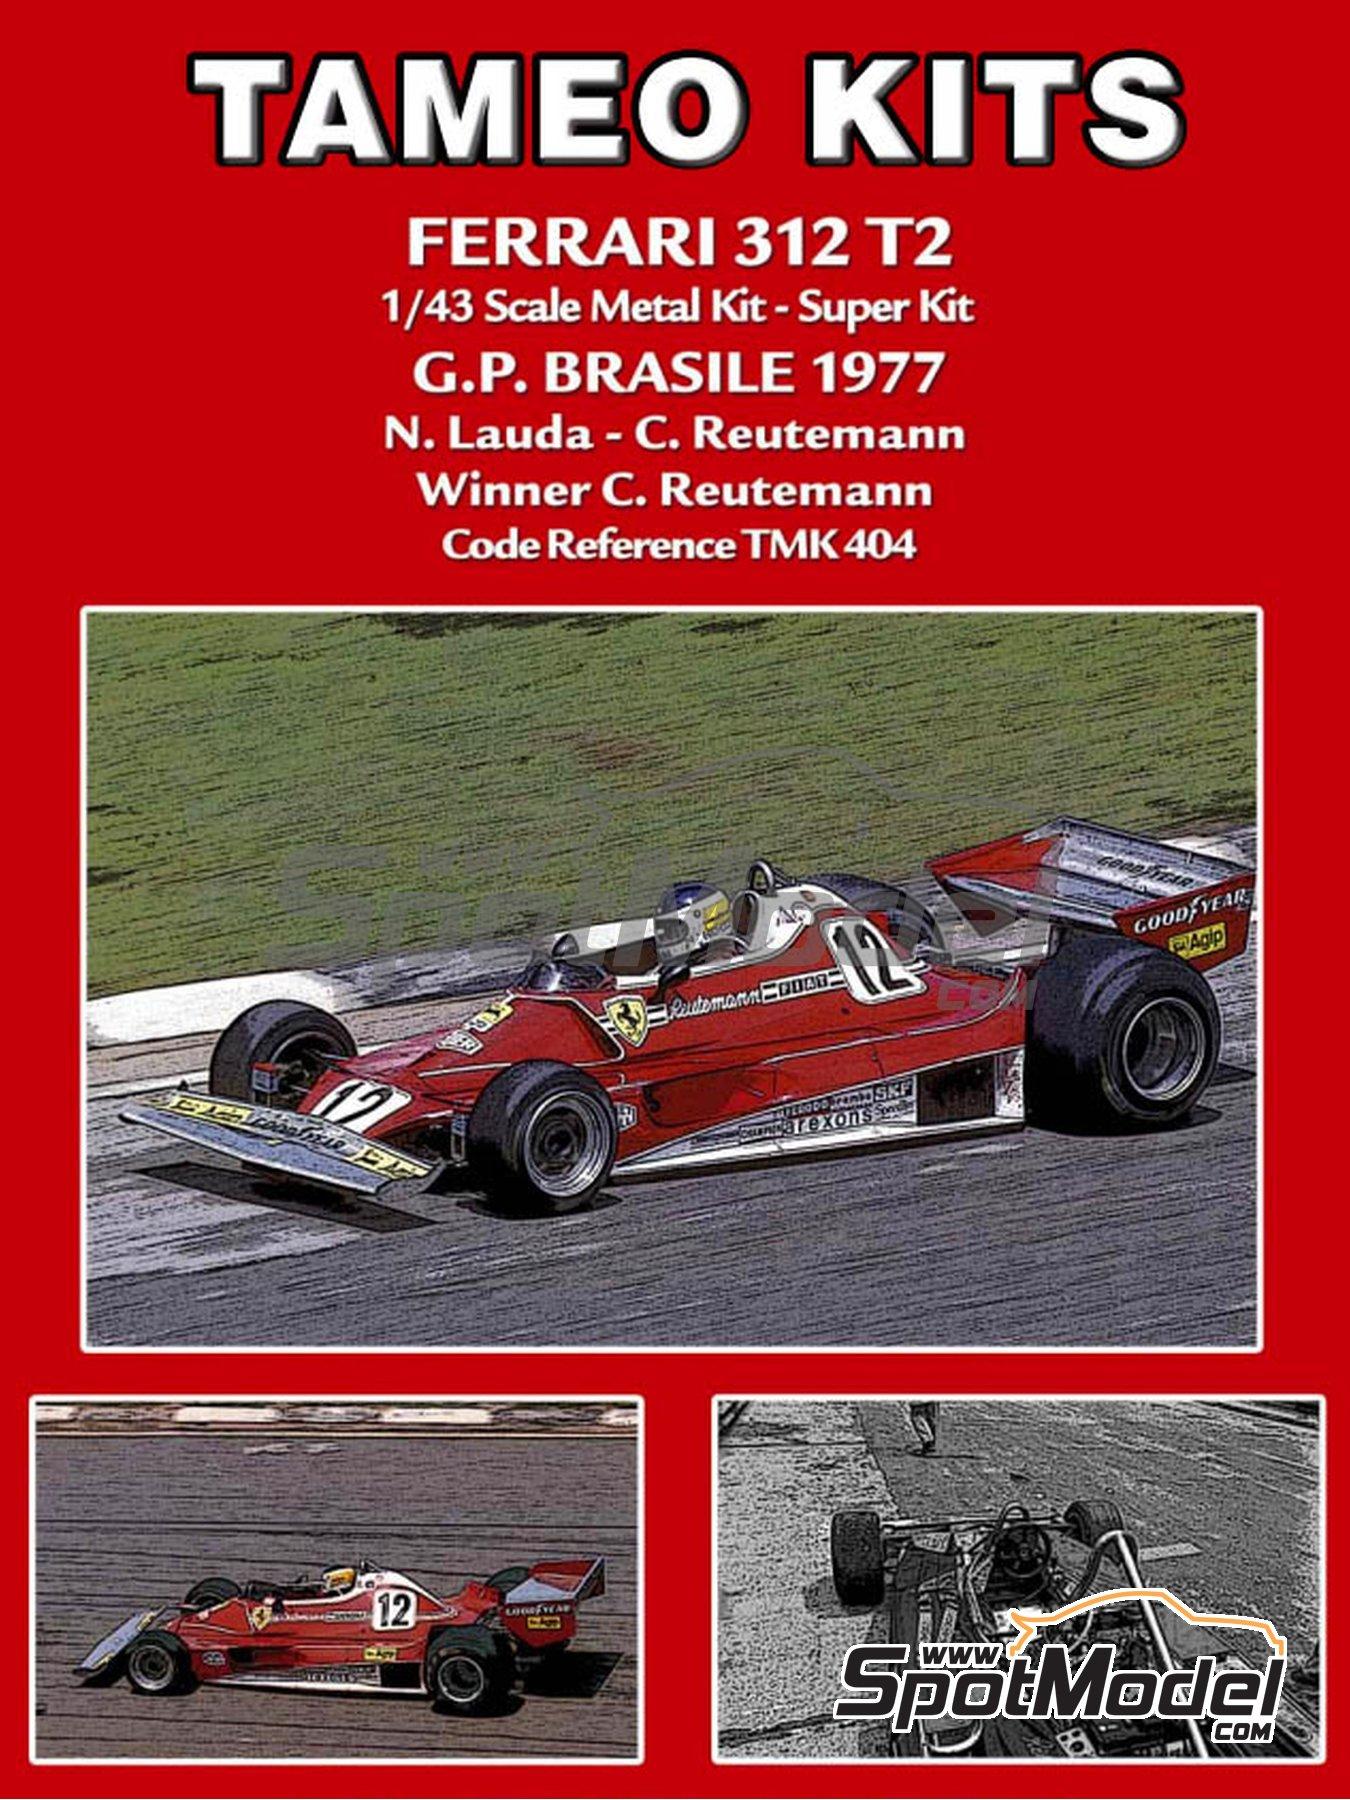 Ferrari 312T2 Fiat - Gran Premio de Fórmula 1 de Brasil 1977 | Maqueta de coche en escala1/43 fabricado por Tameo Kits (ref.TMK404) image